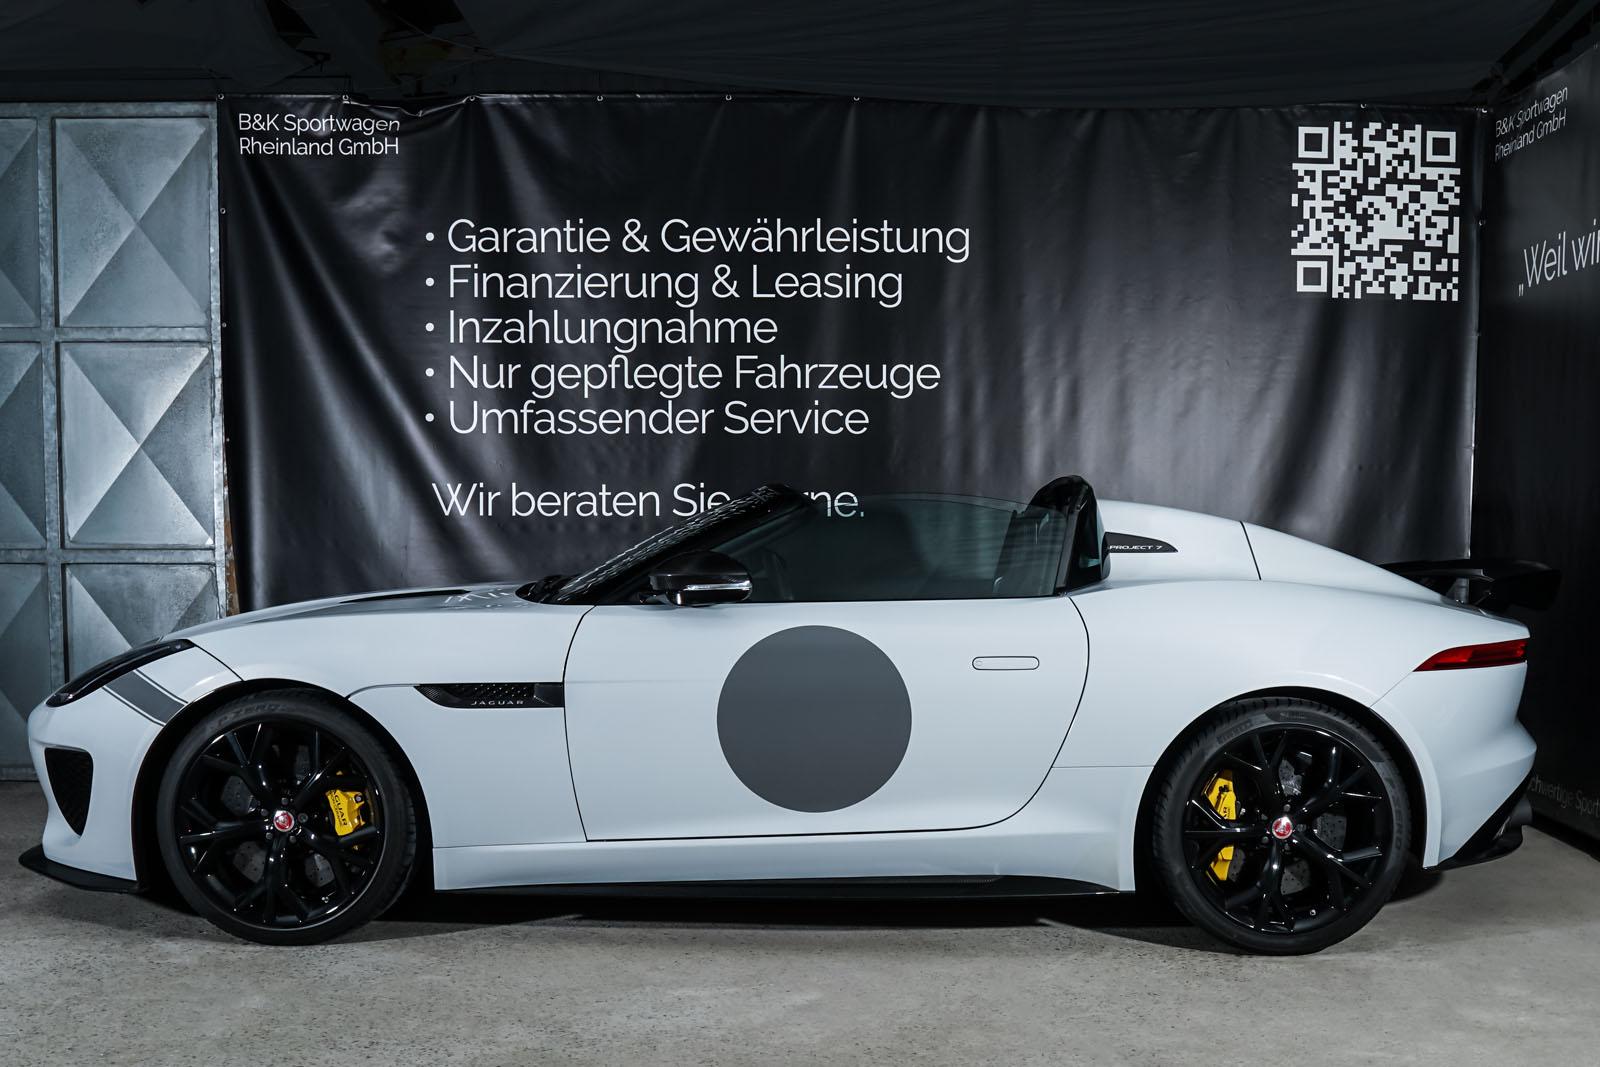 Jaguar_Project7_Weiss_Schwarz_JAG-0829_6_w